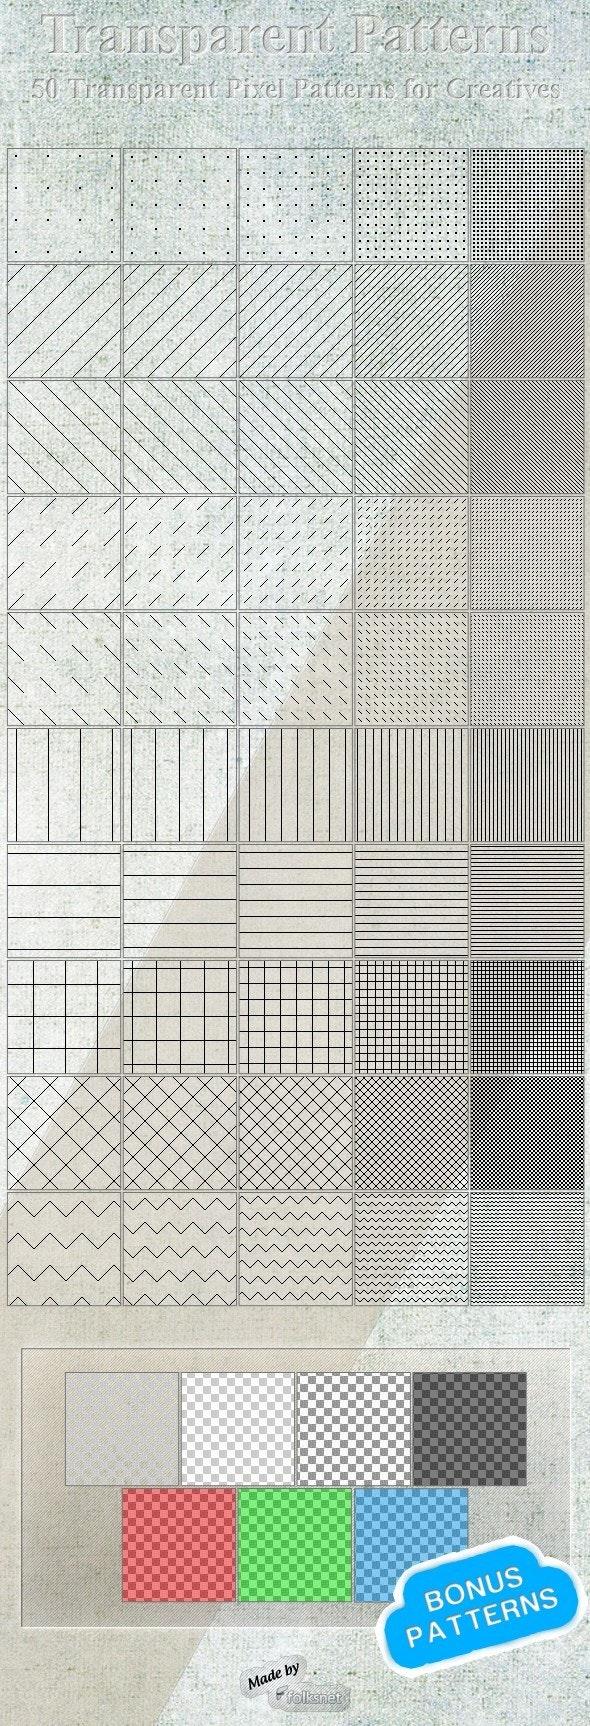 Transparent Patterns - Urban Textures / Fills / Patterns